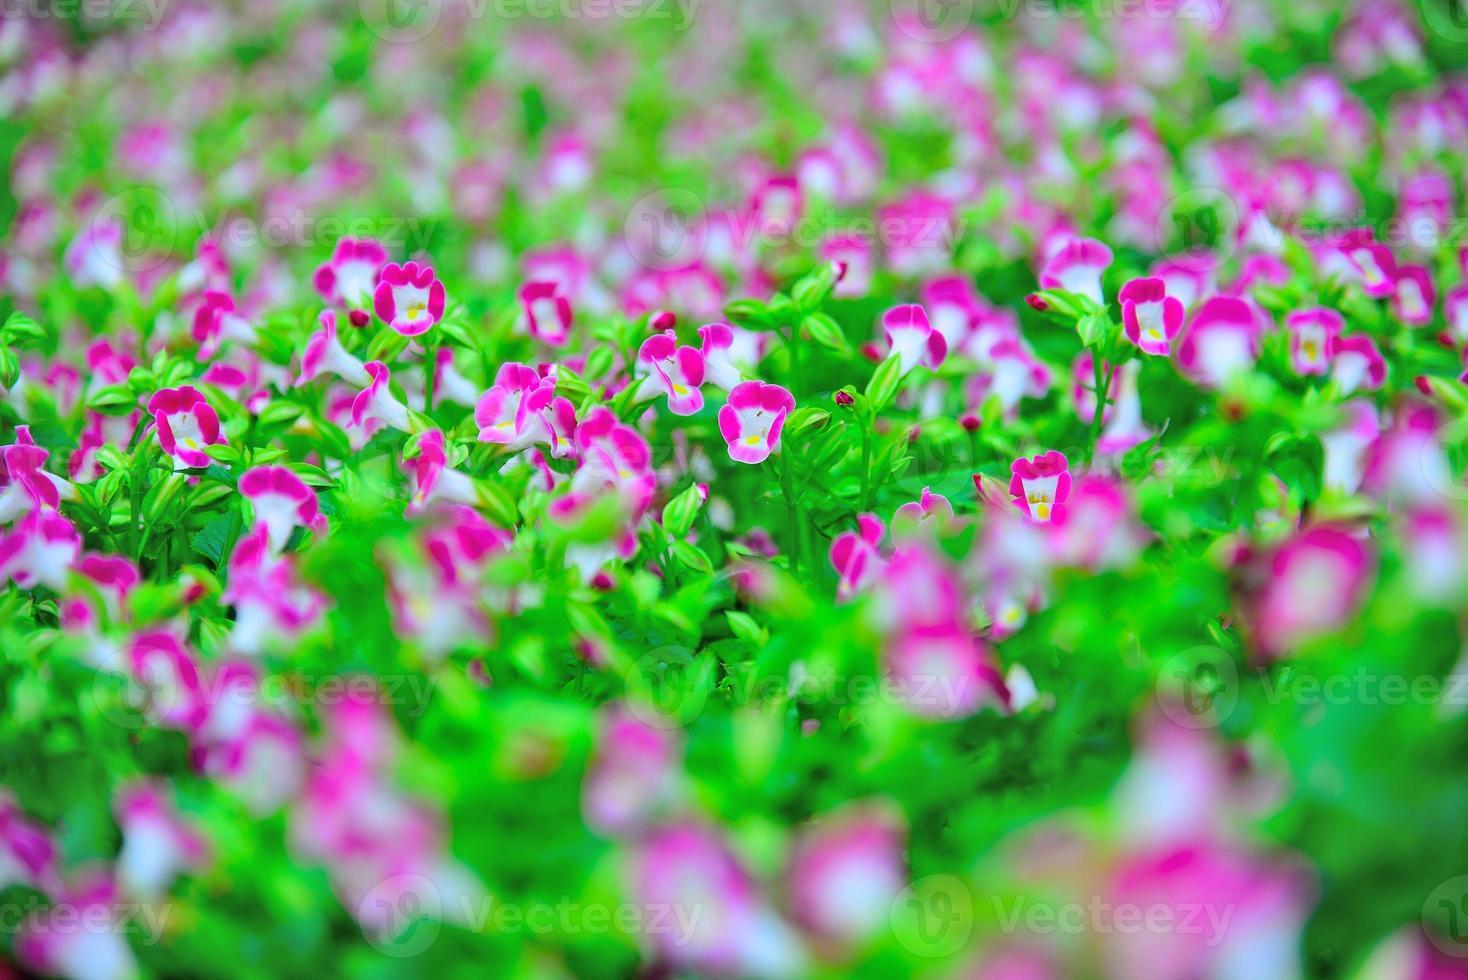 jardín de flores de pavo real purpurina púrpura foto